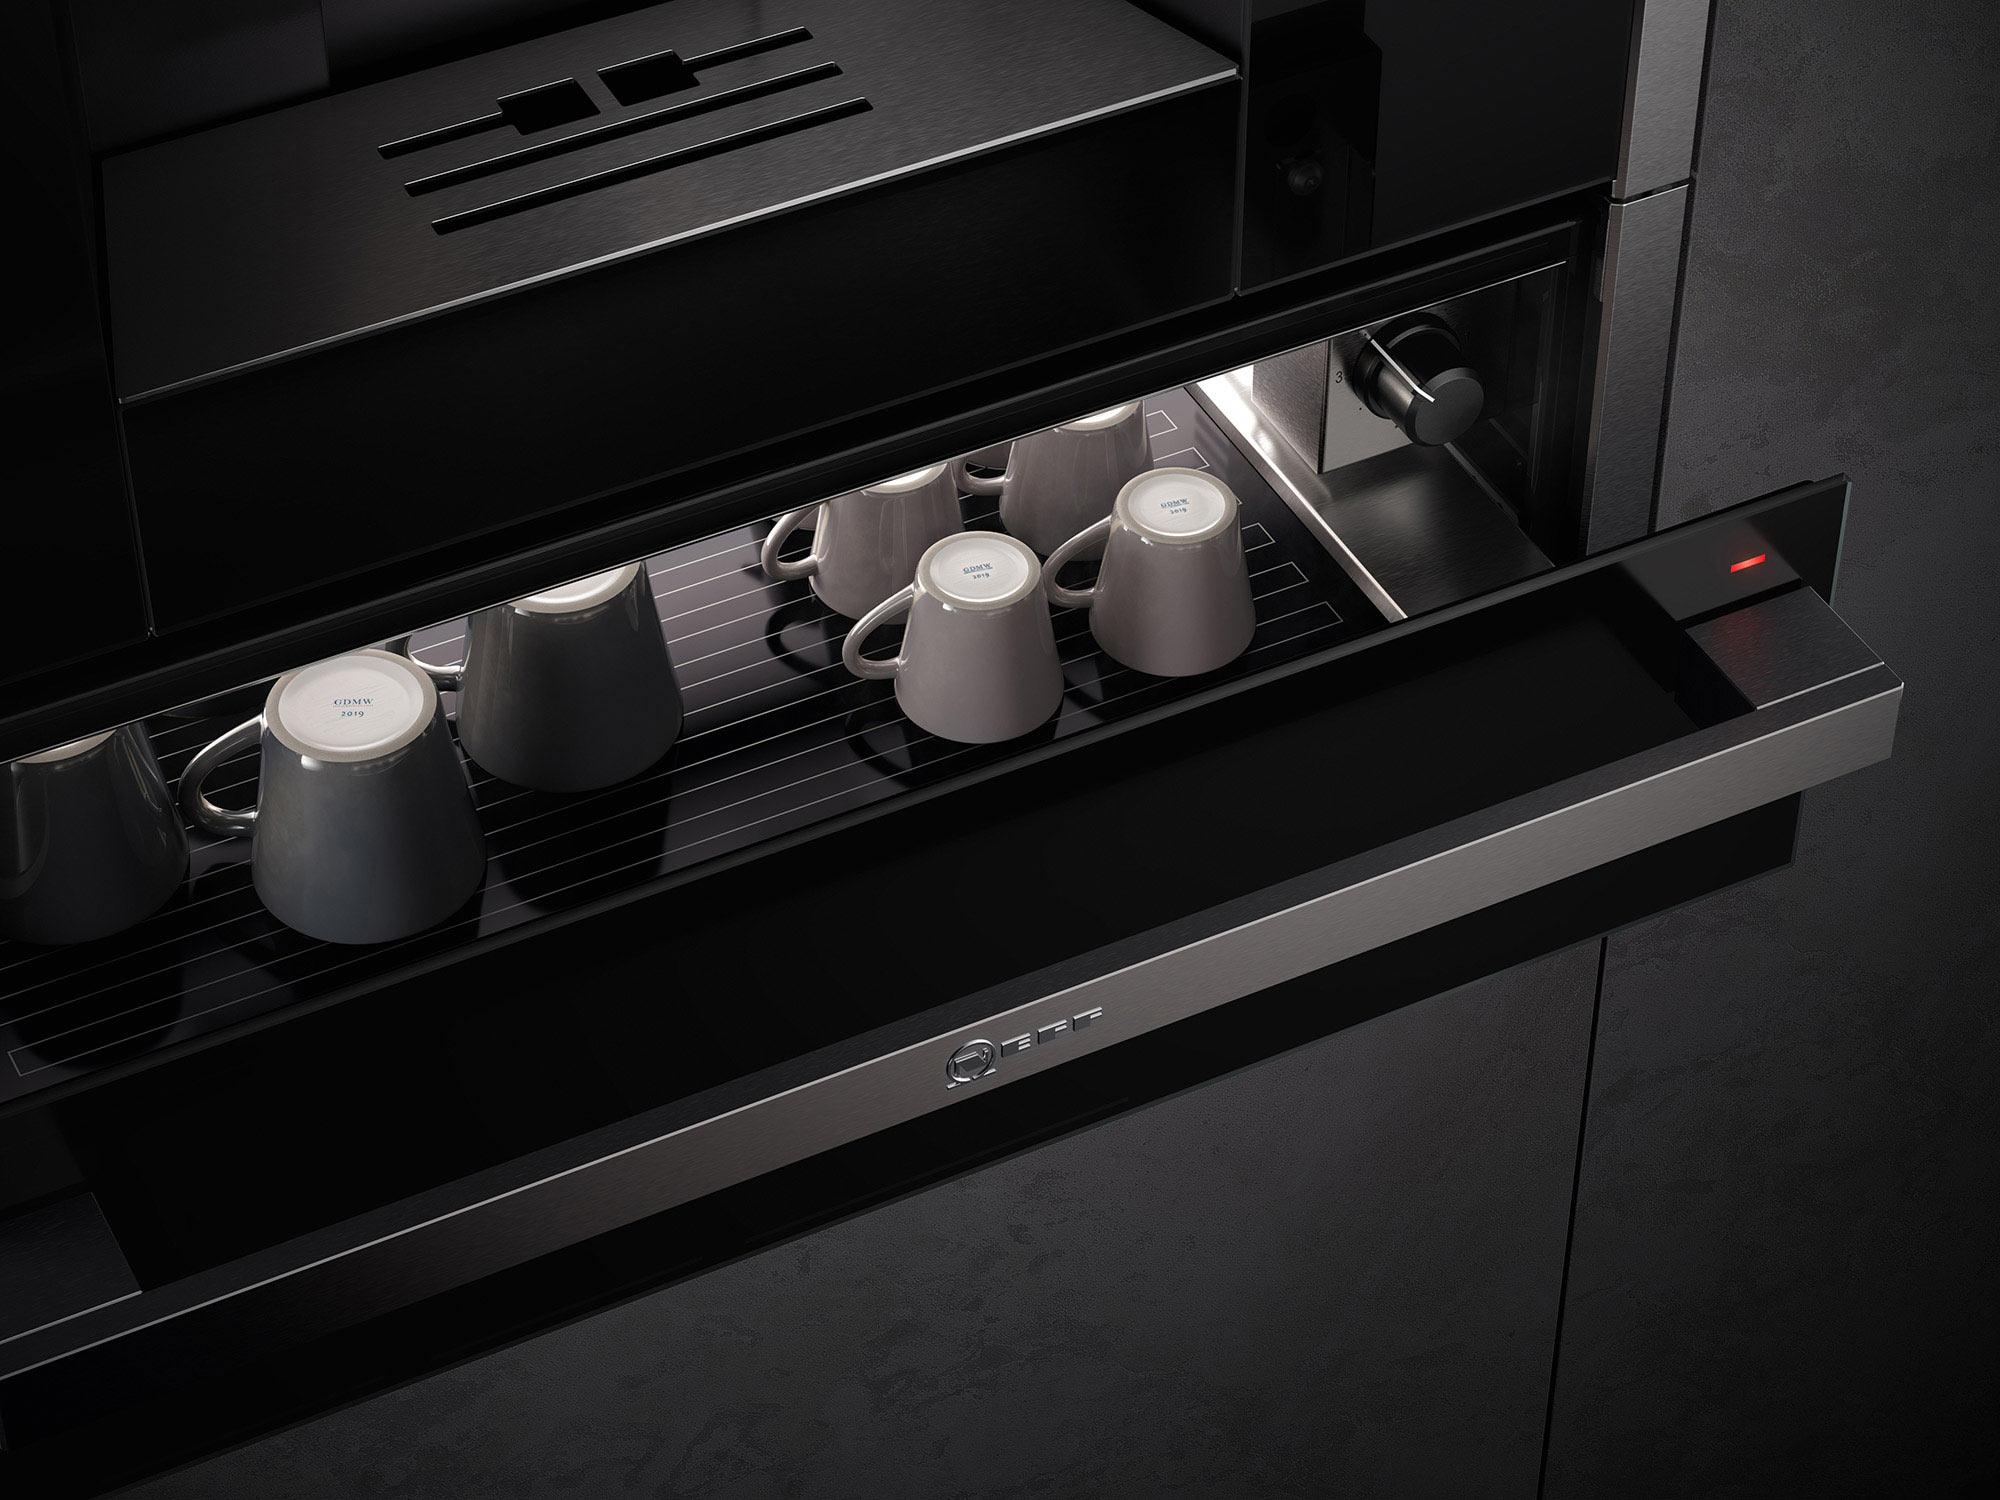 Home Appliances- Warming drawer